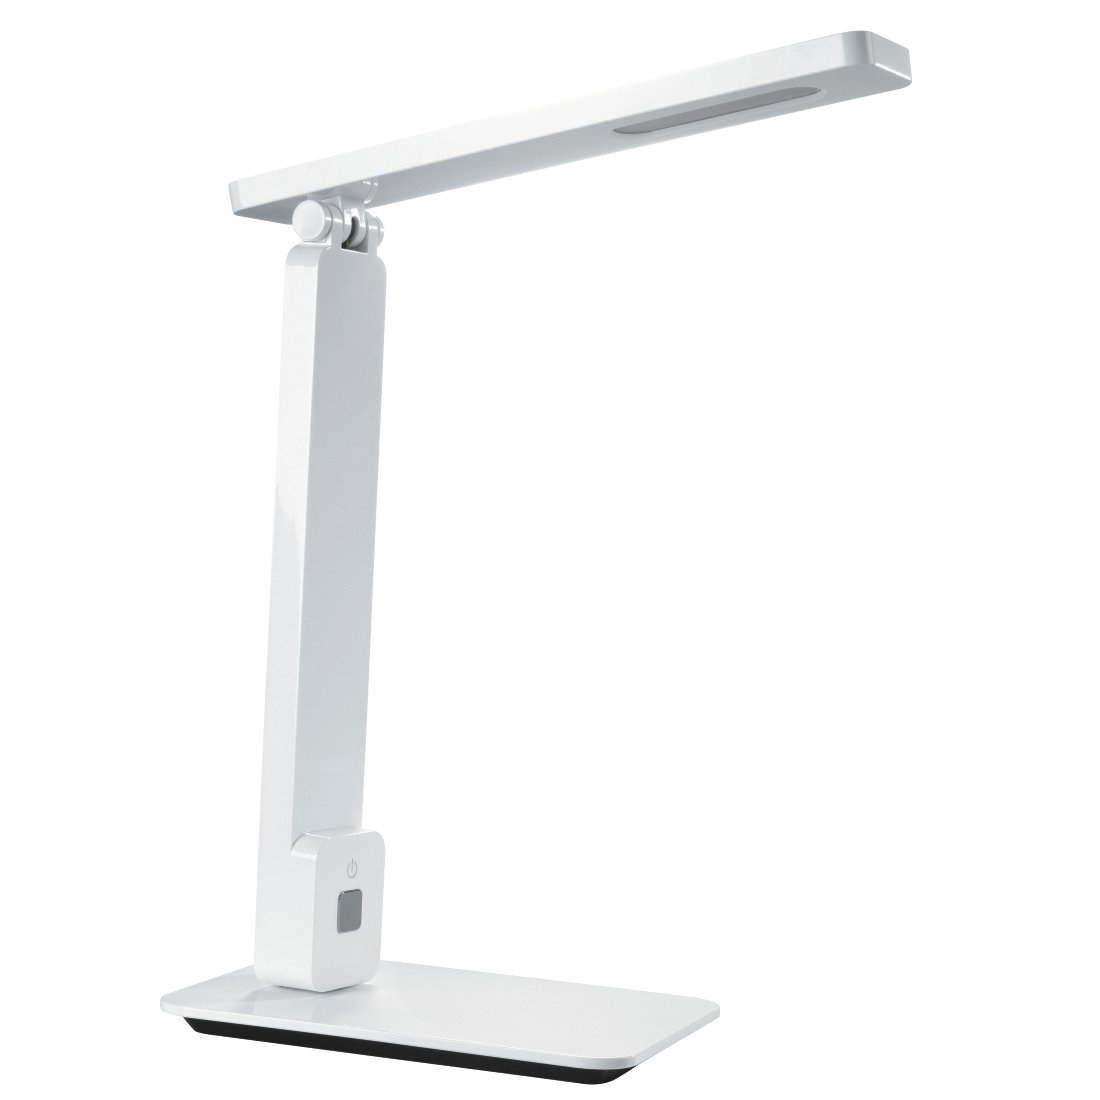 led bureaulamp online bestellen kijk dan hier otto. Black Bedroom Furniture Sets. Home Design Ideas